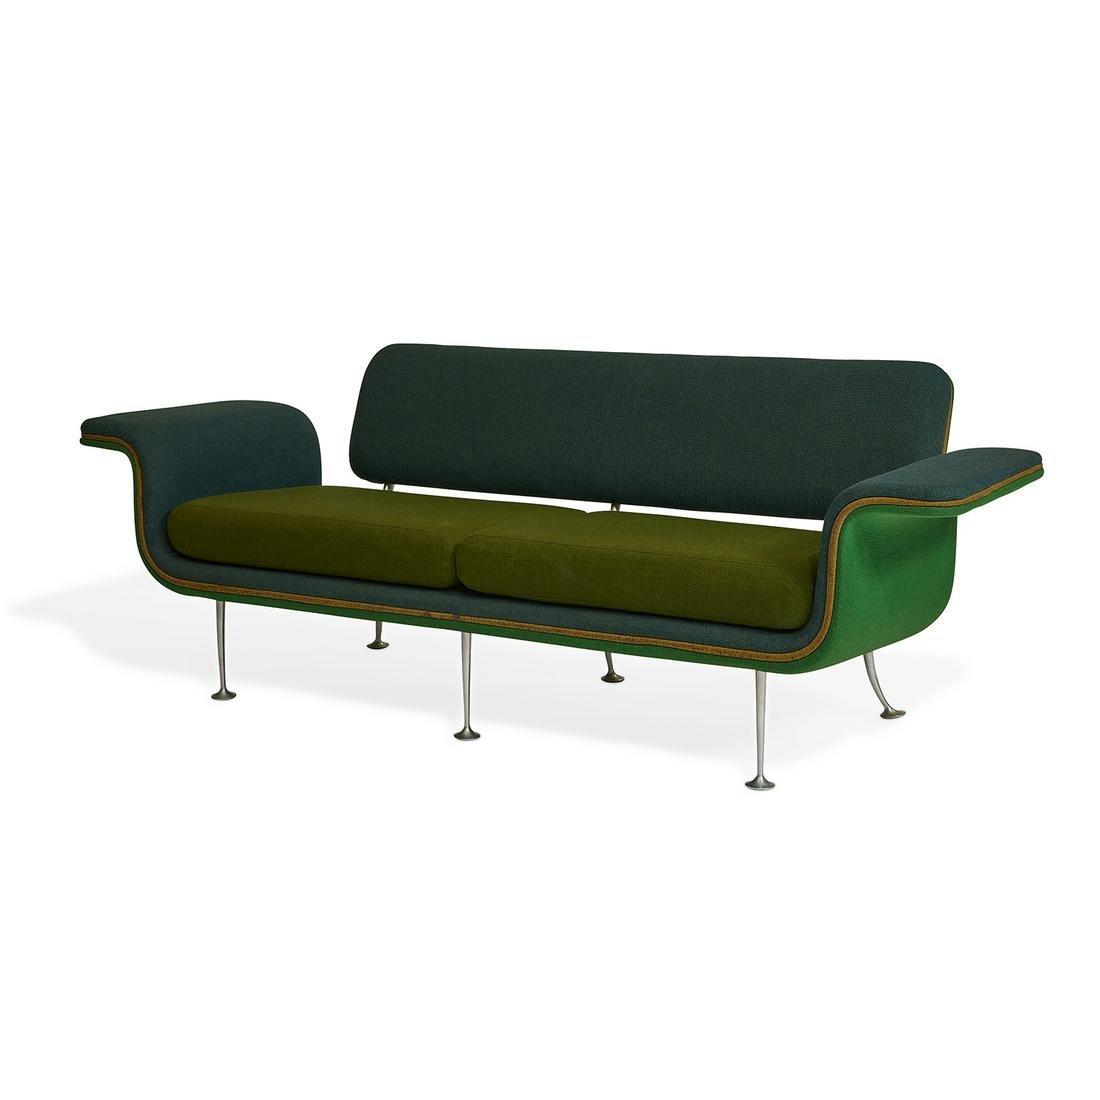 Alexander Girard for Herman Miller sofa